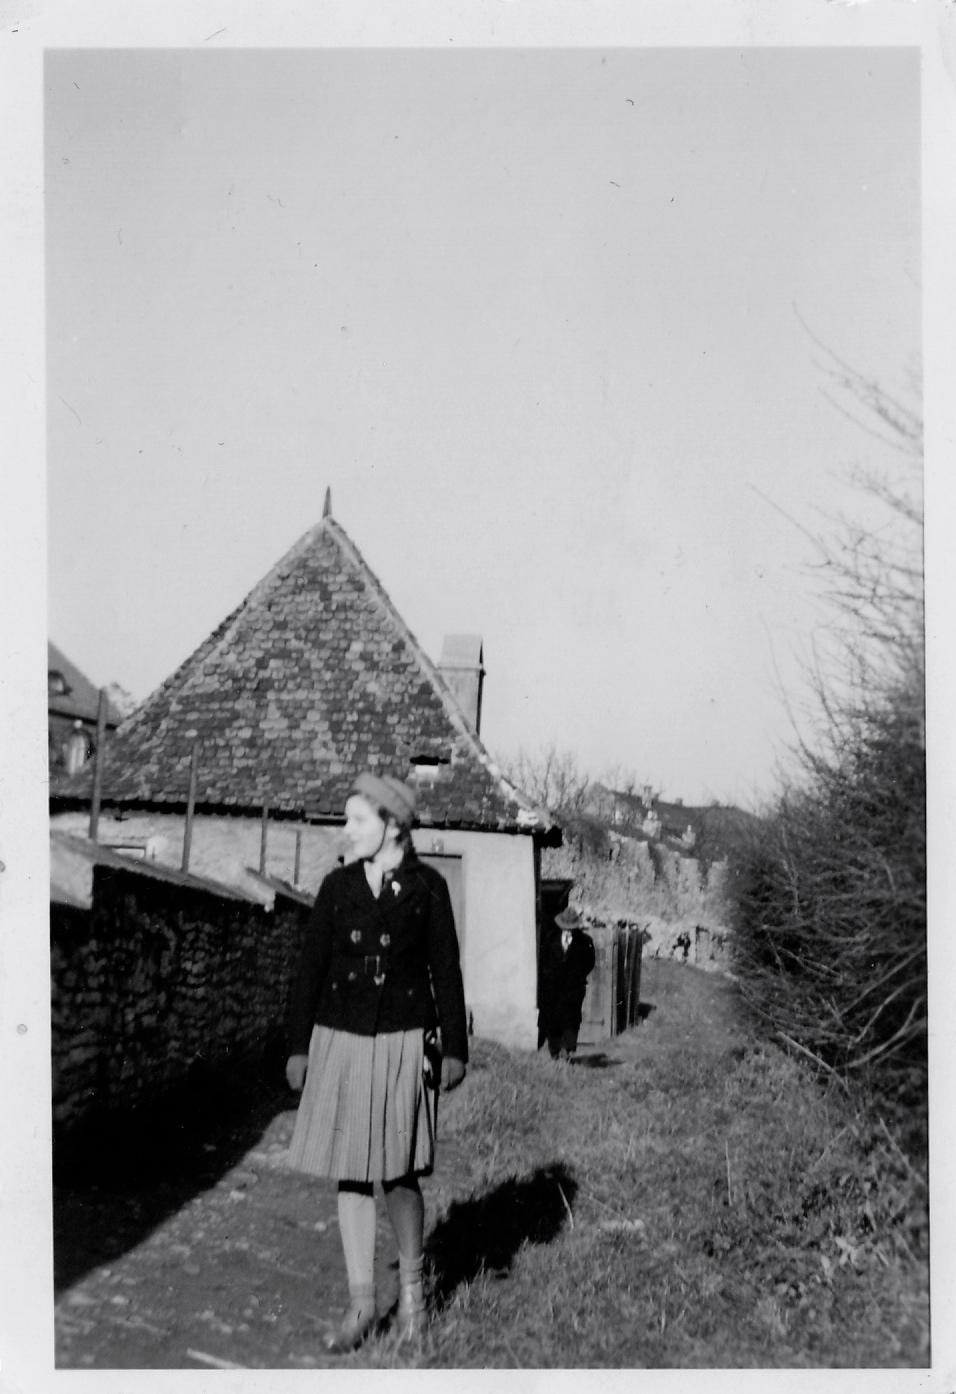 Frau Elfriede Leubner um 1940 am Häuschen auf dem Höpperlesturm